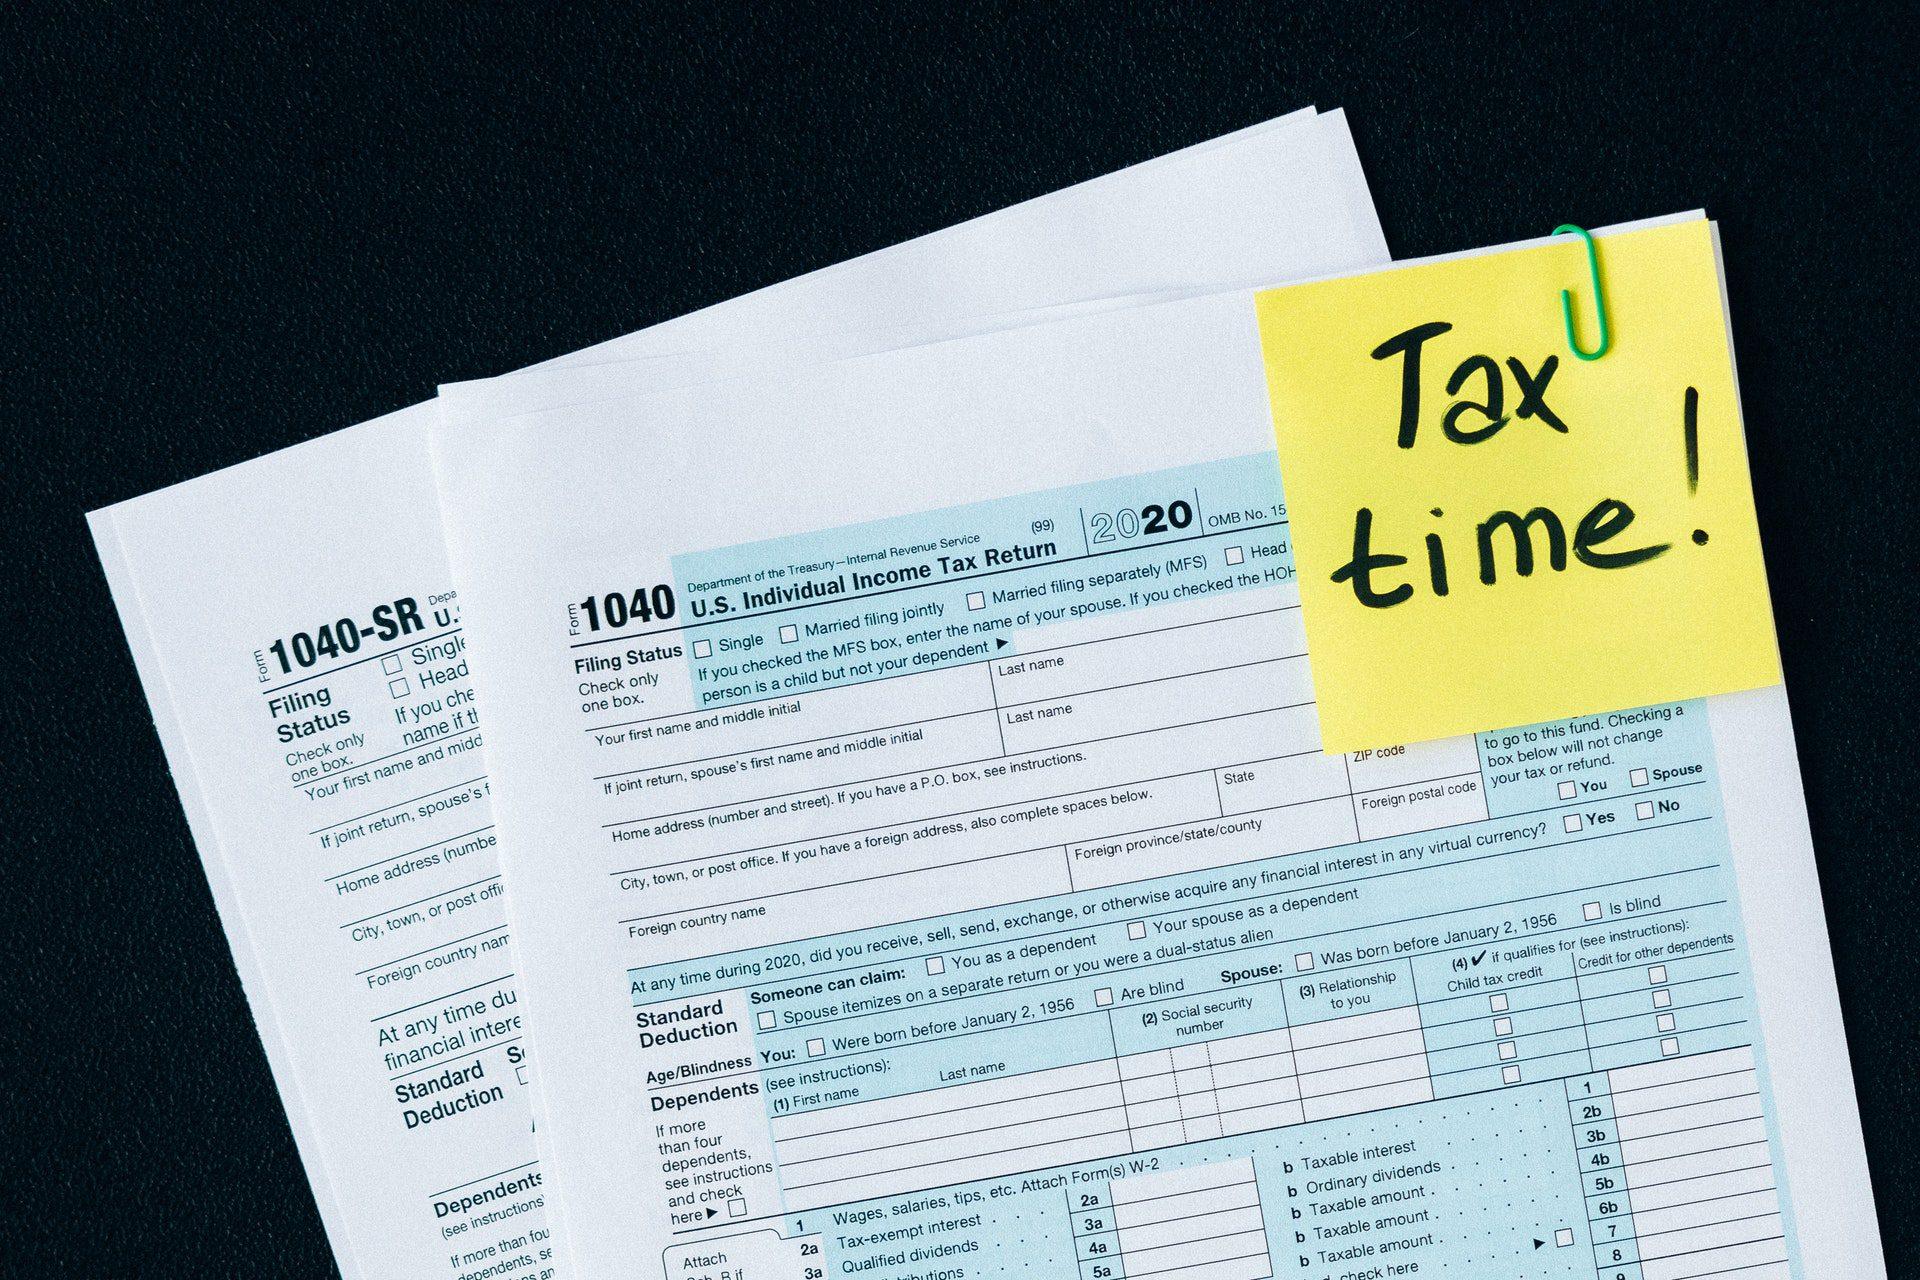 Getting Ready for Tax Season 2020